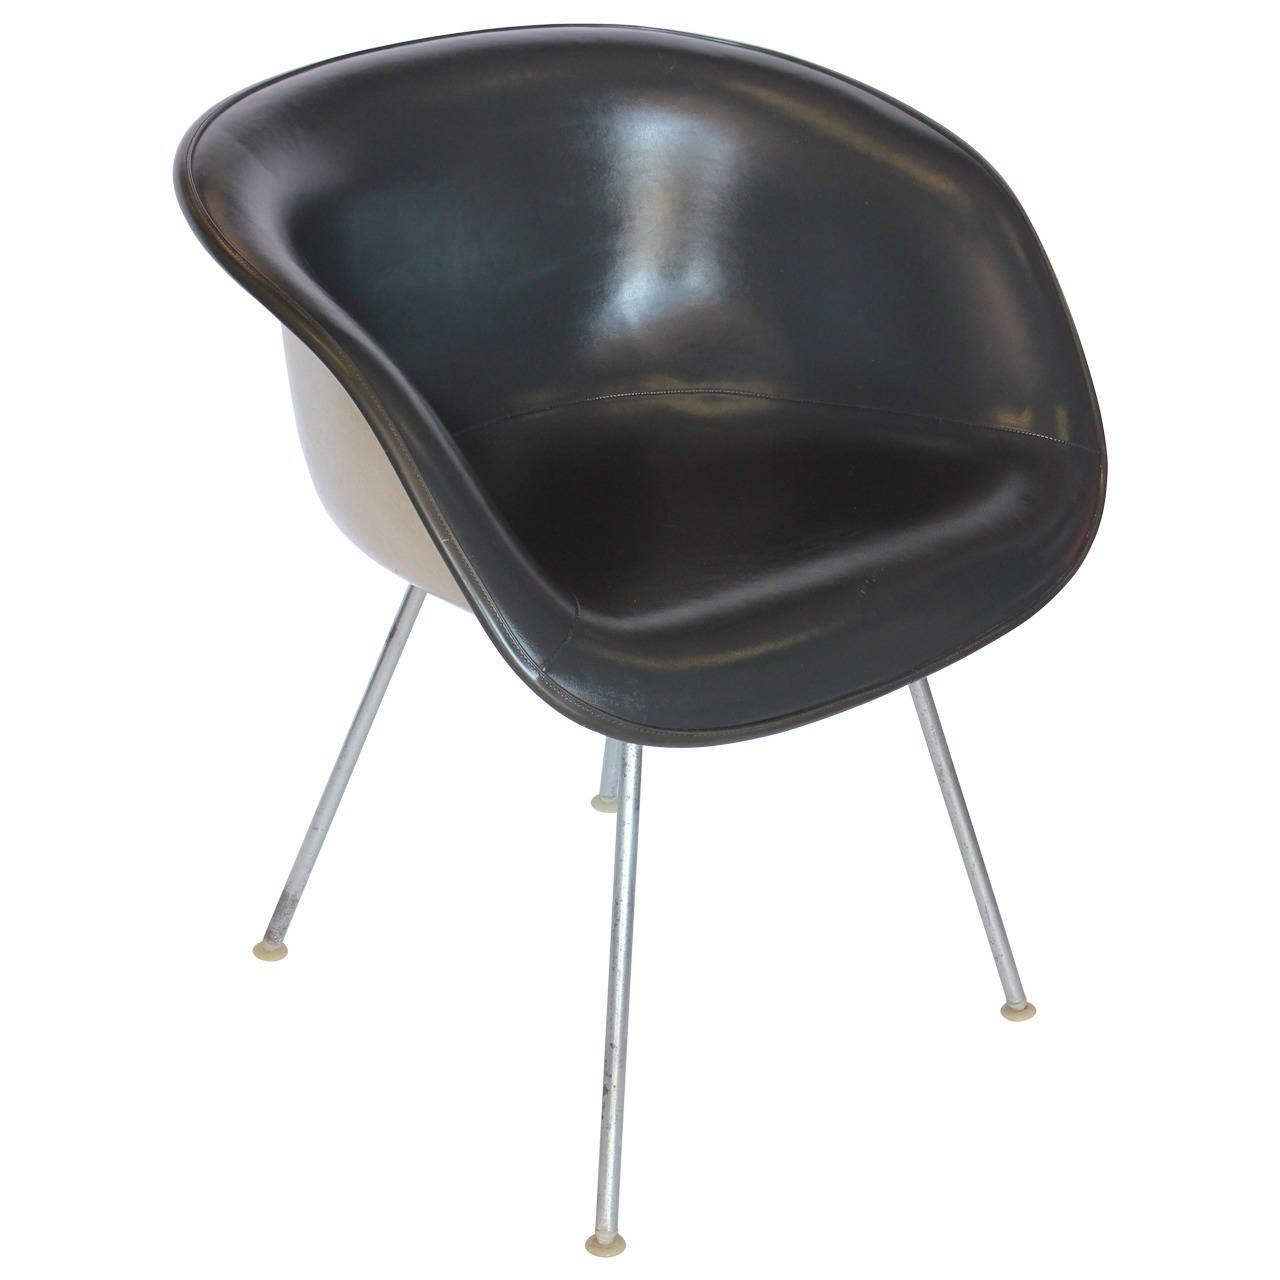 Eames Grey Naugahyde Chair By Herman Miller At 1stdibs